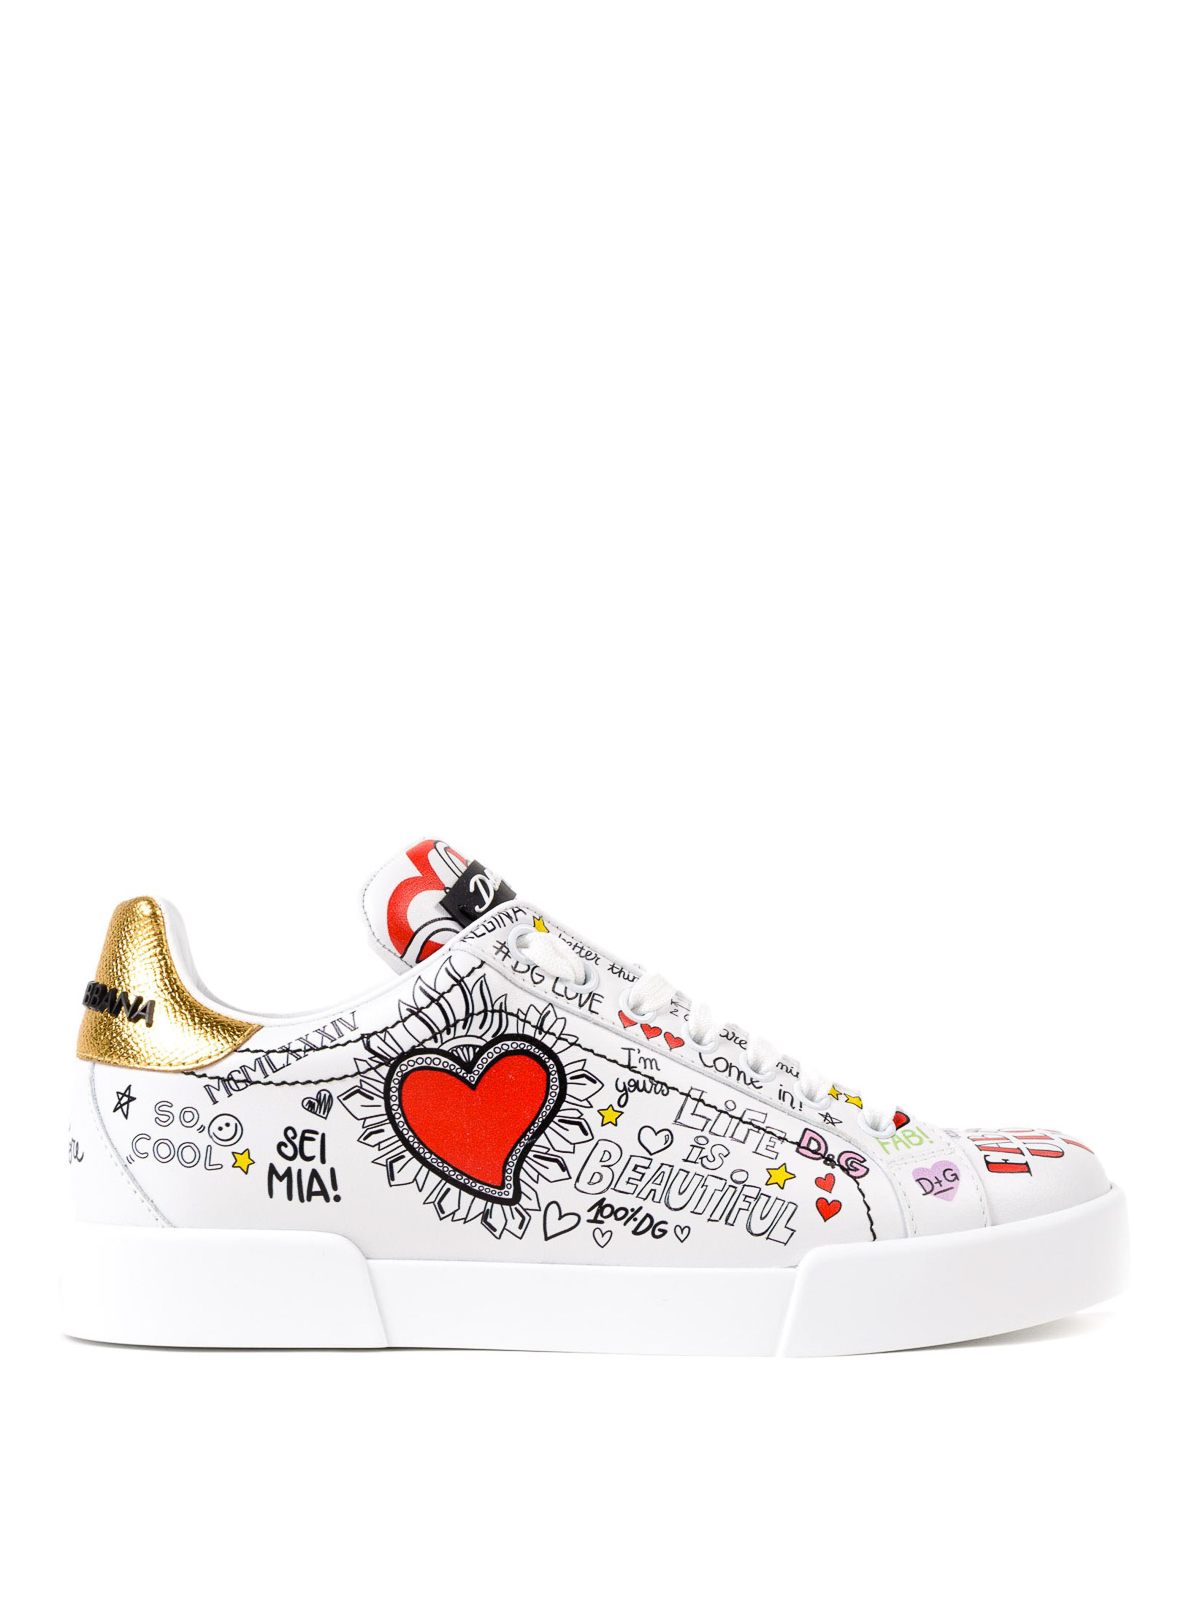 4799117511a dolce--gabbana-trainers-portofino-mural-print-sneakers -00000132424f00s001.jpg